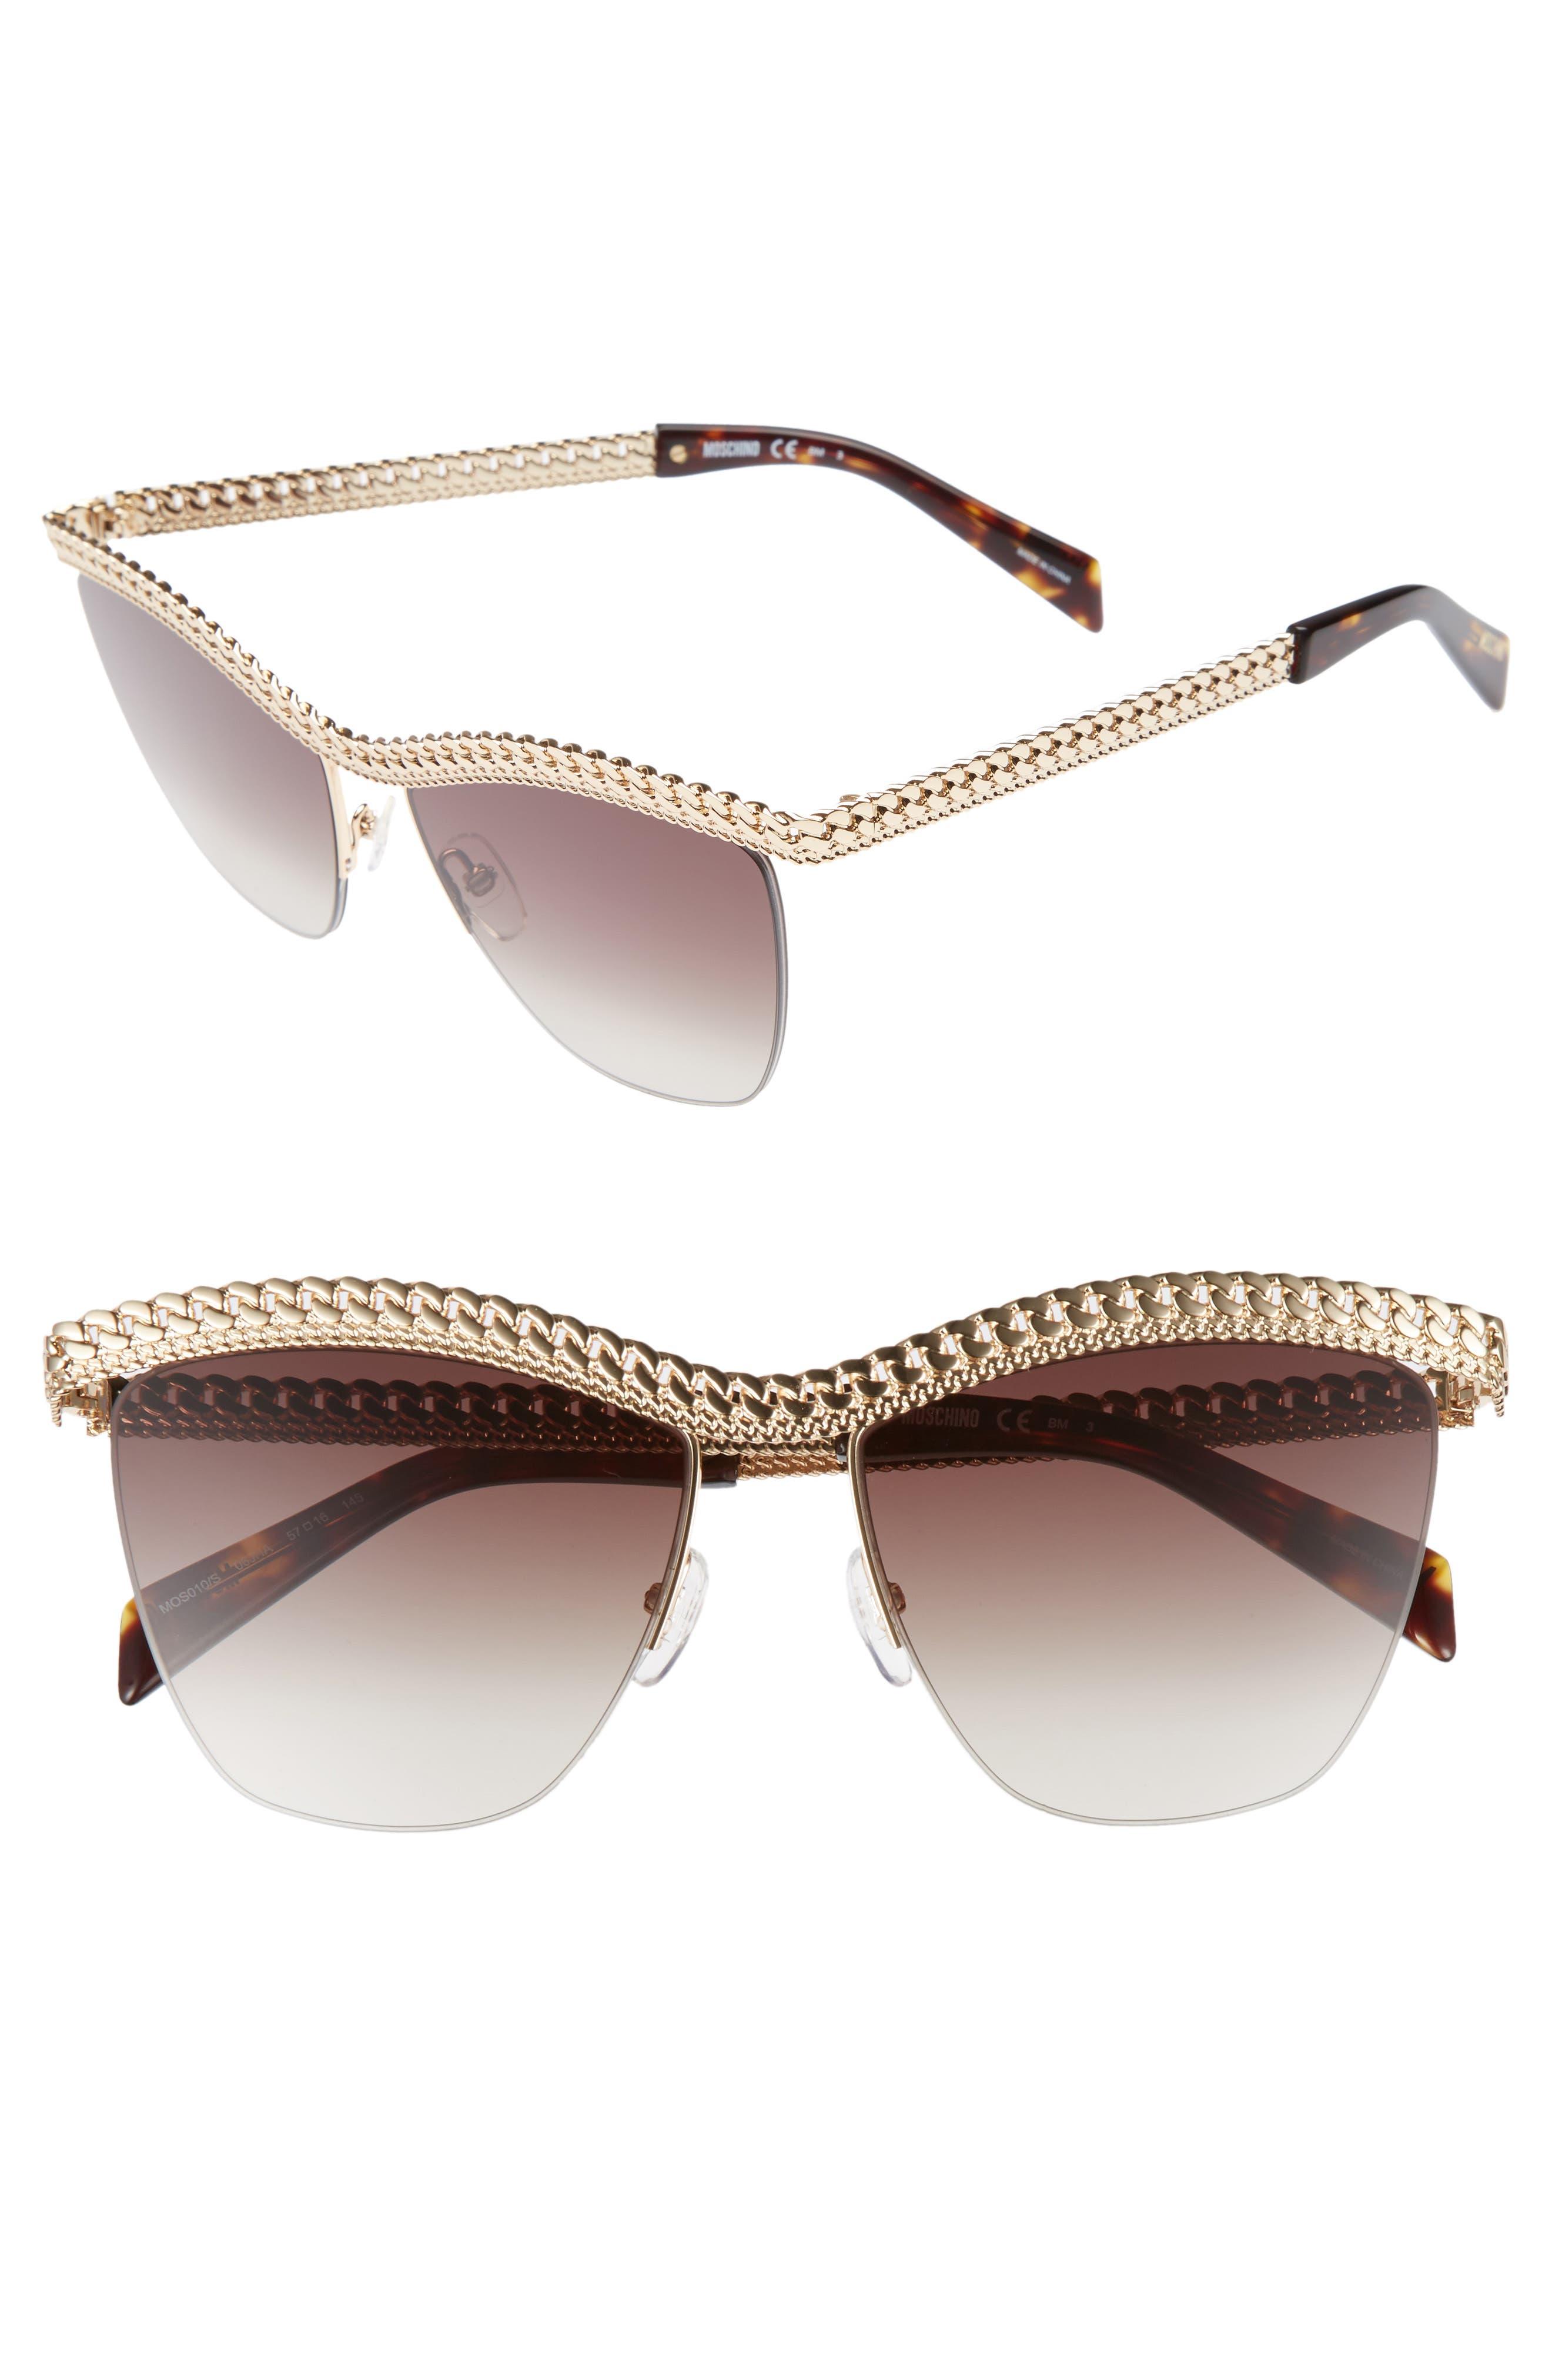 MOSCHINO,                             57mm Rimless Metal Bar Polarized Sunglasses,                             Main thumbnail 1, color,                             GOLD HAVANA